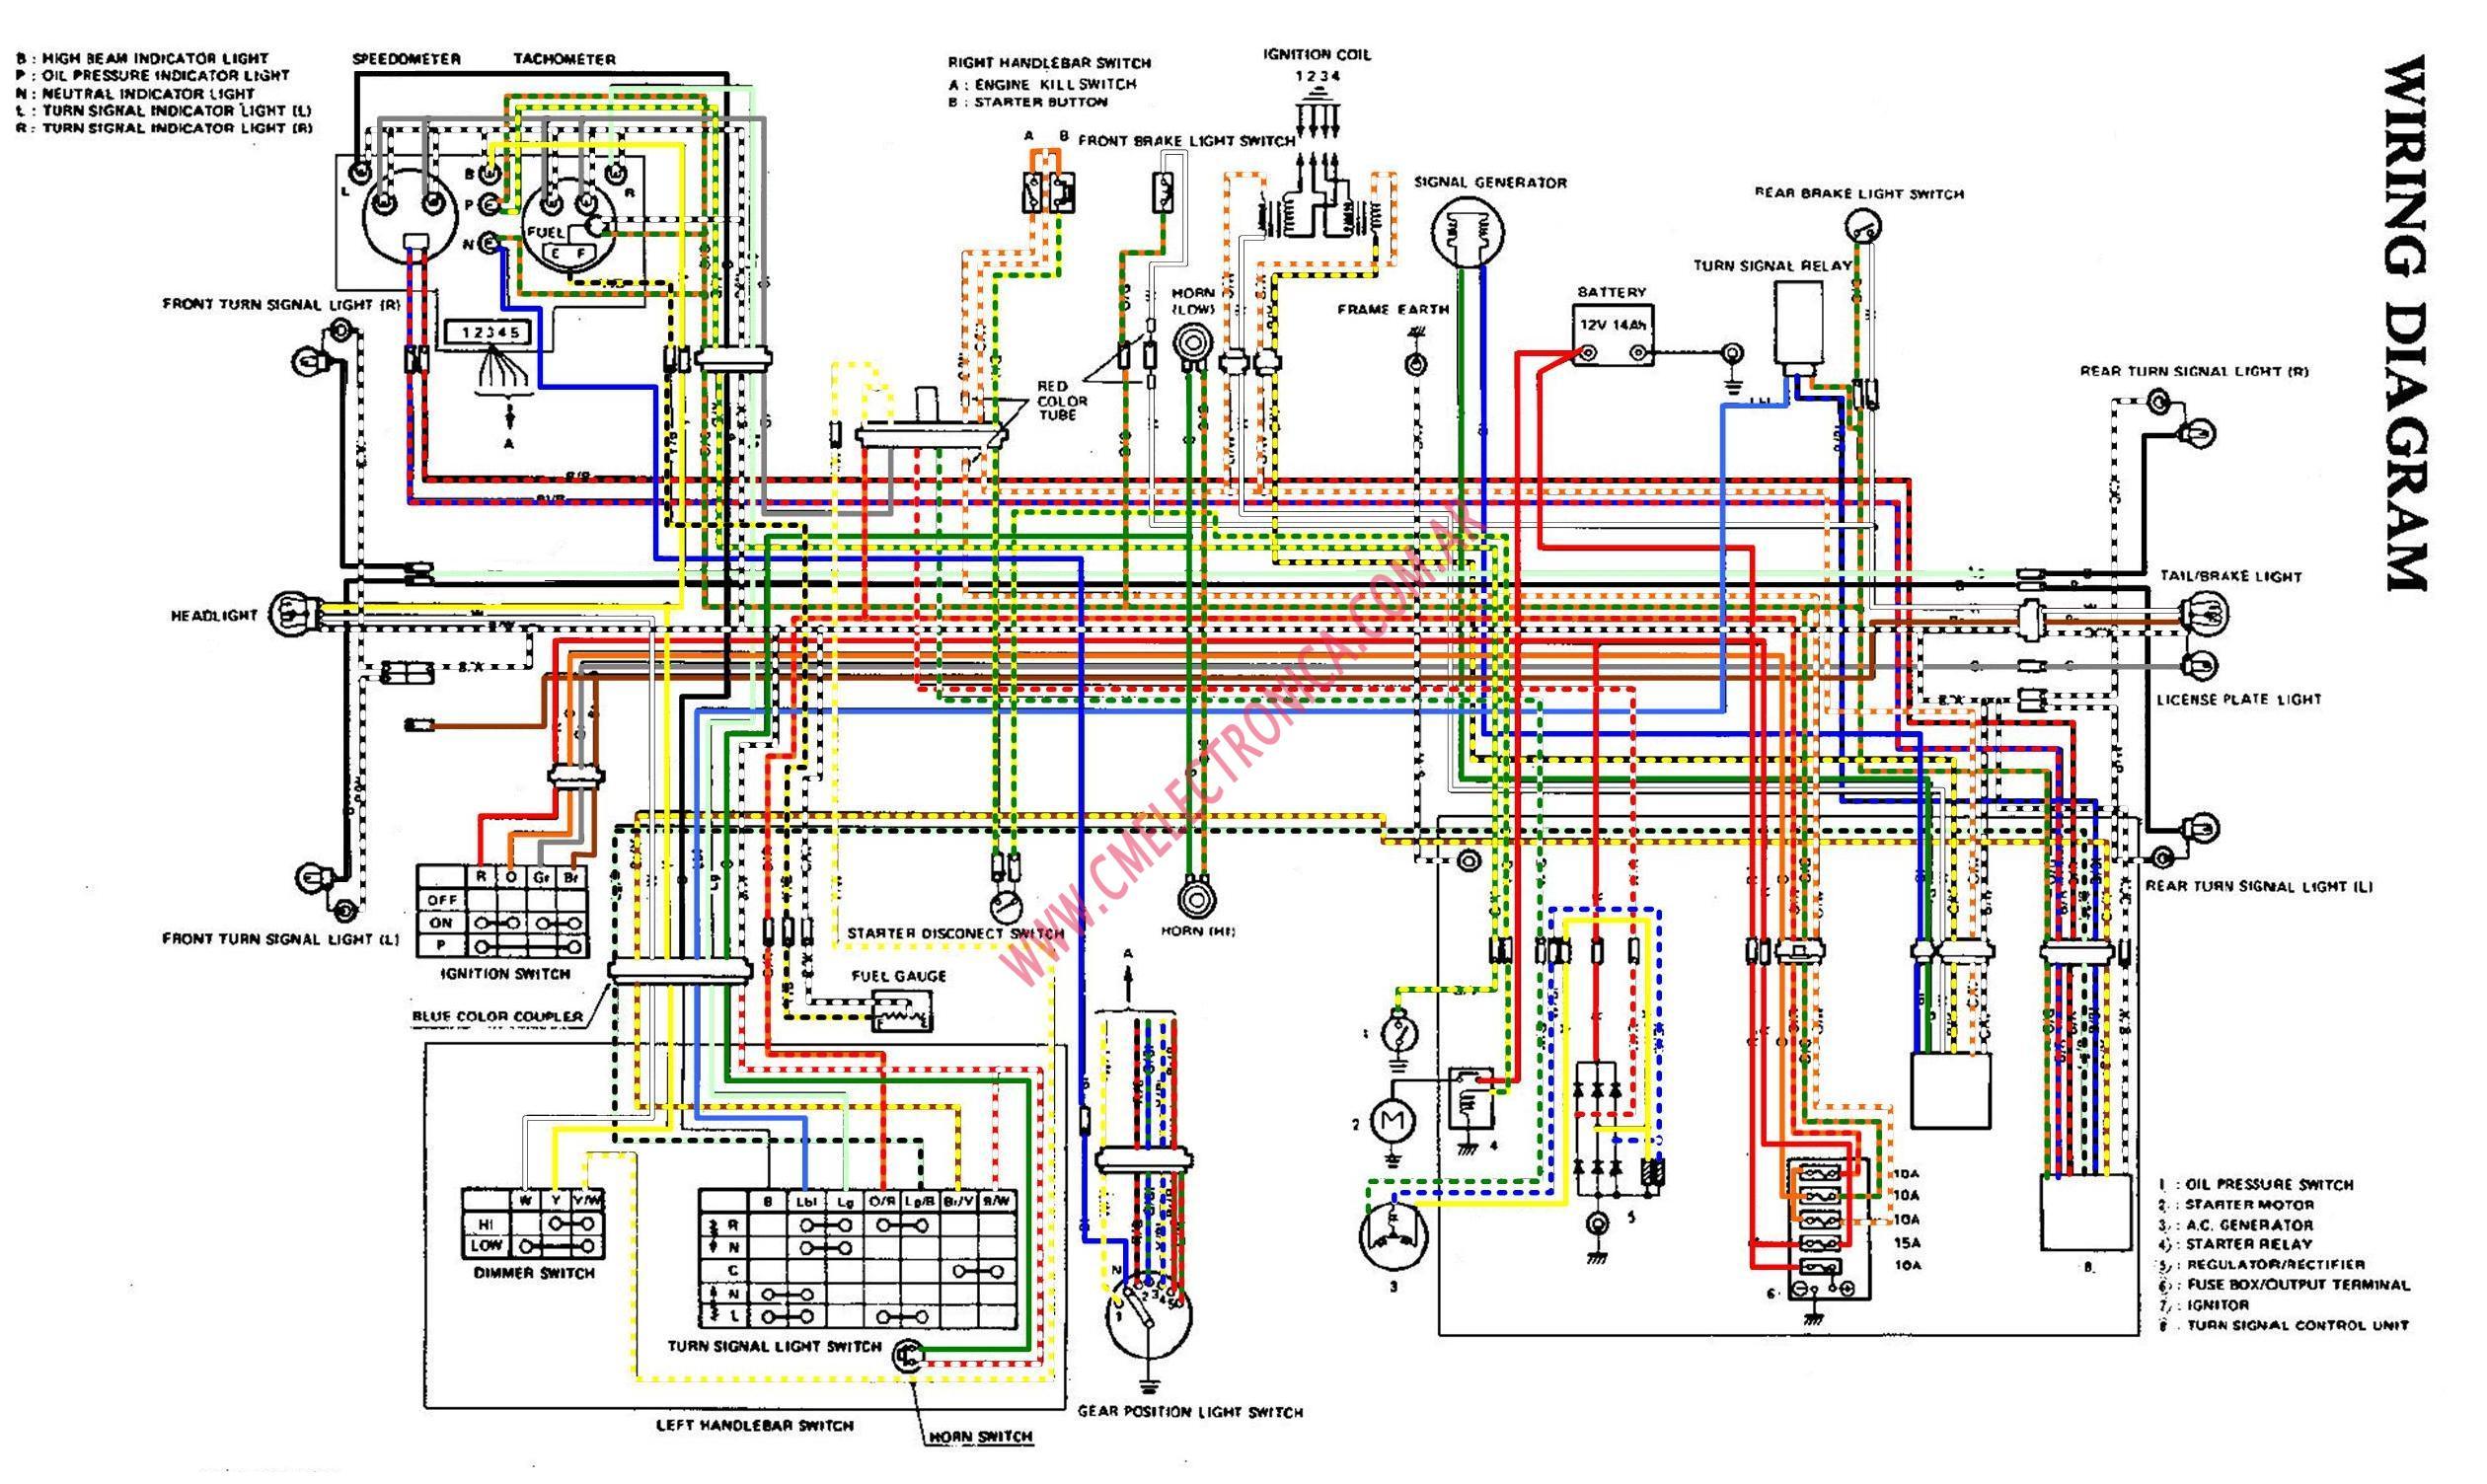 Gs750 Wiring Diagram Auto Electrical Dodge Wayfarer